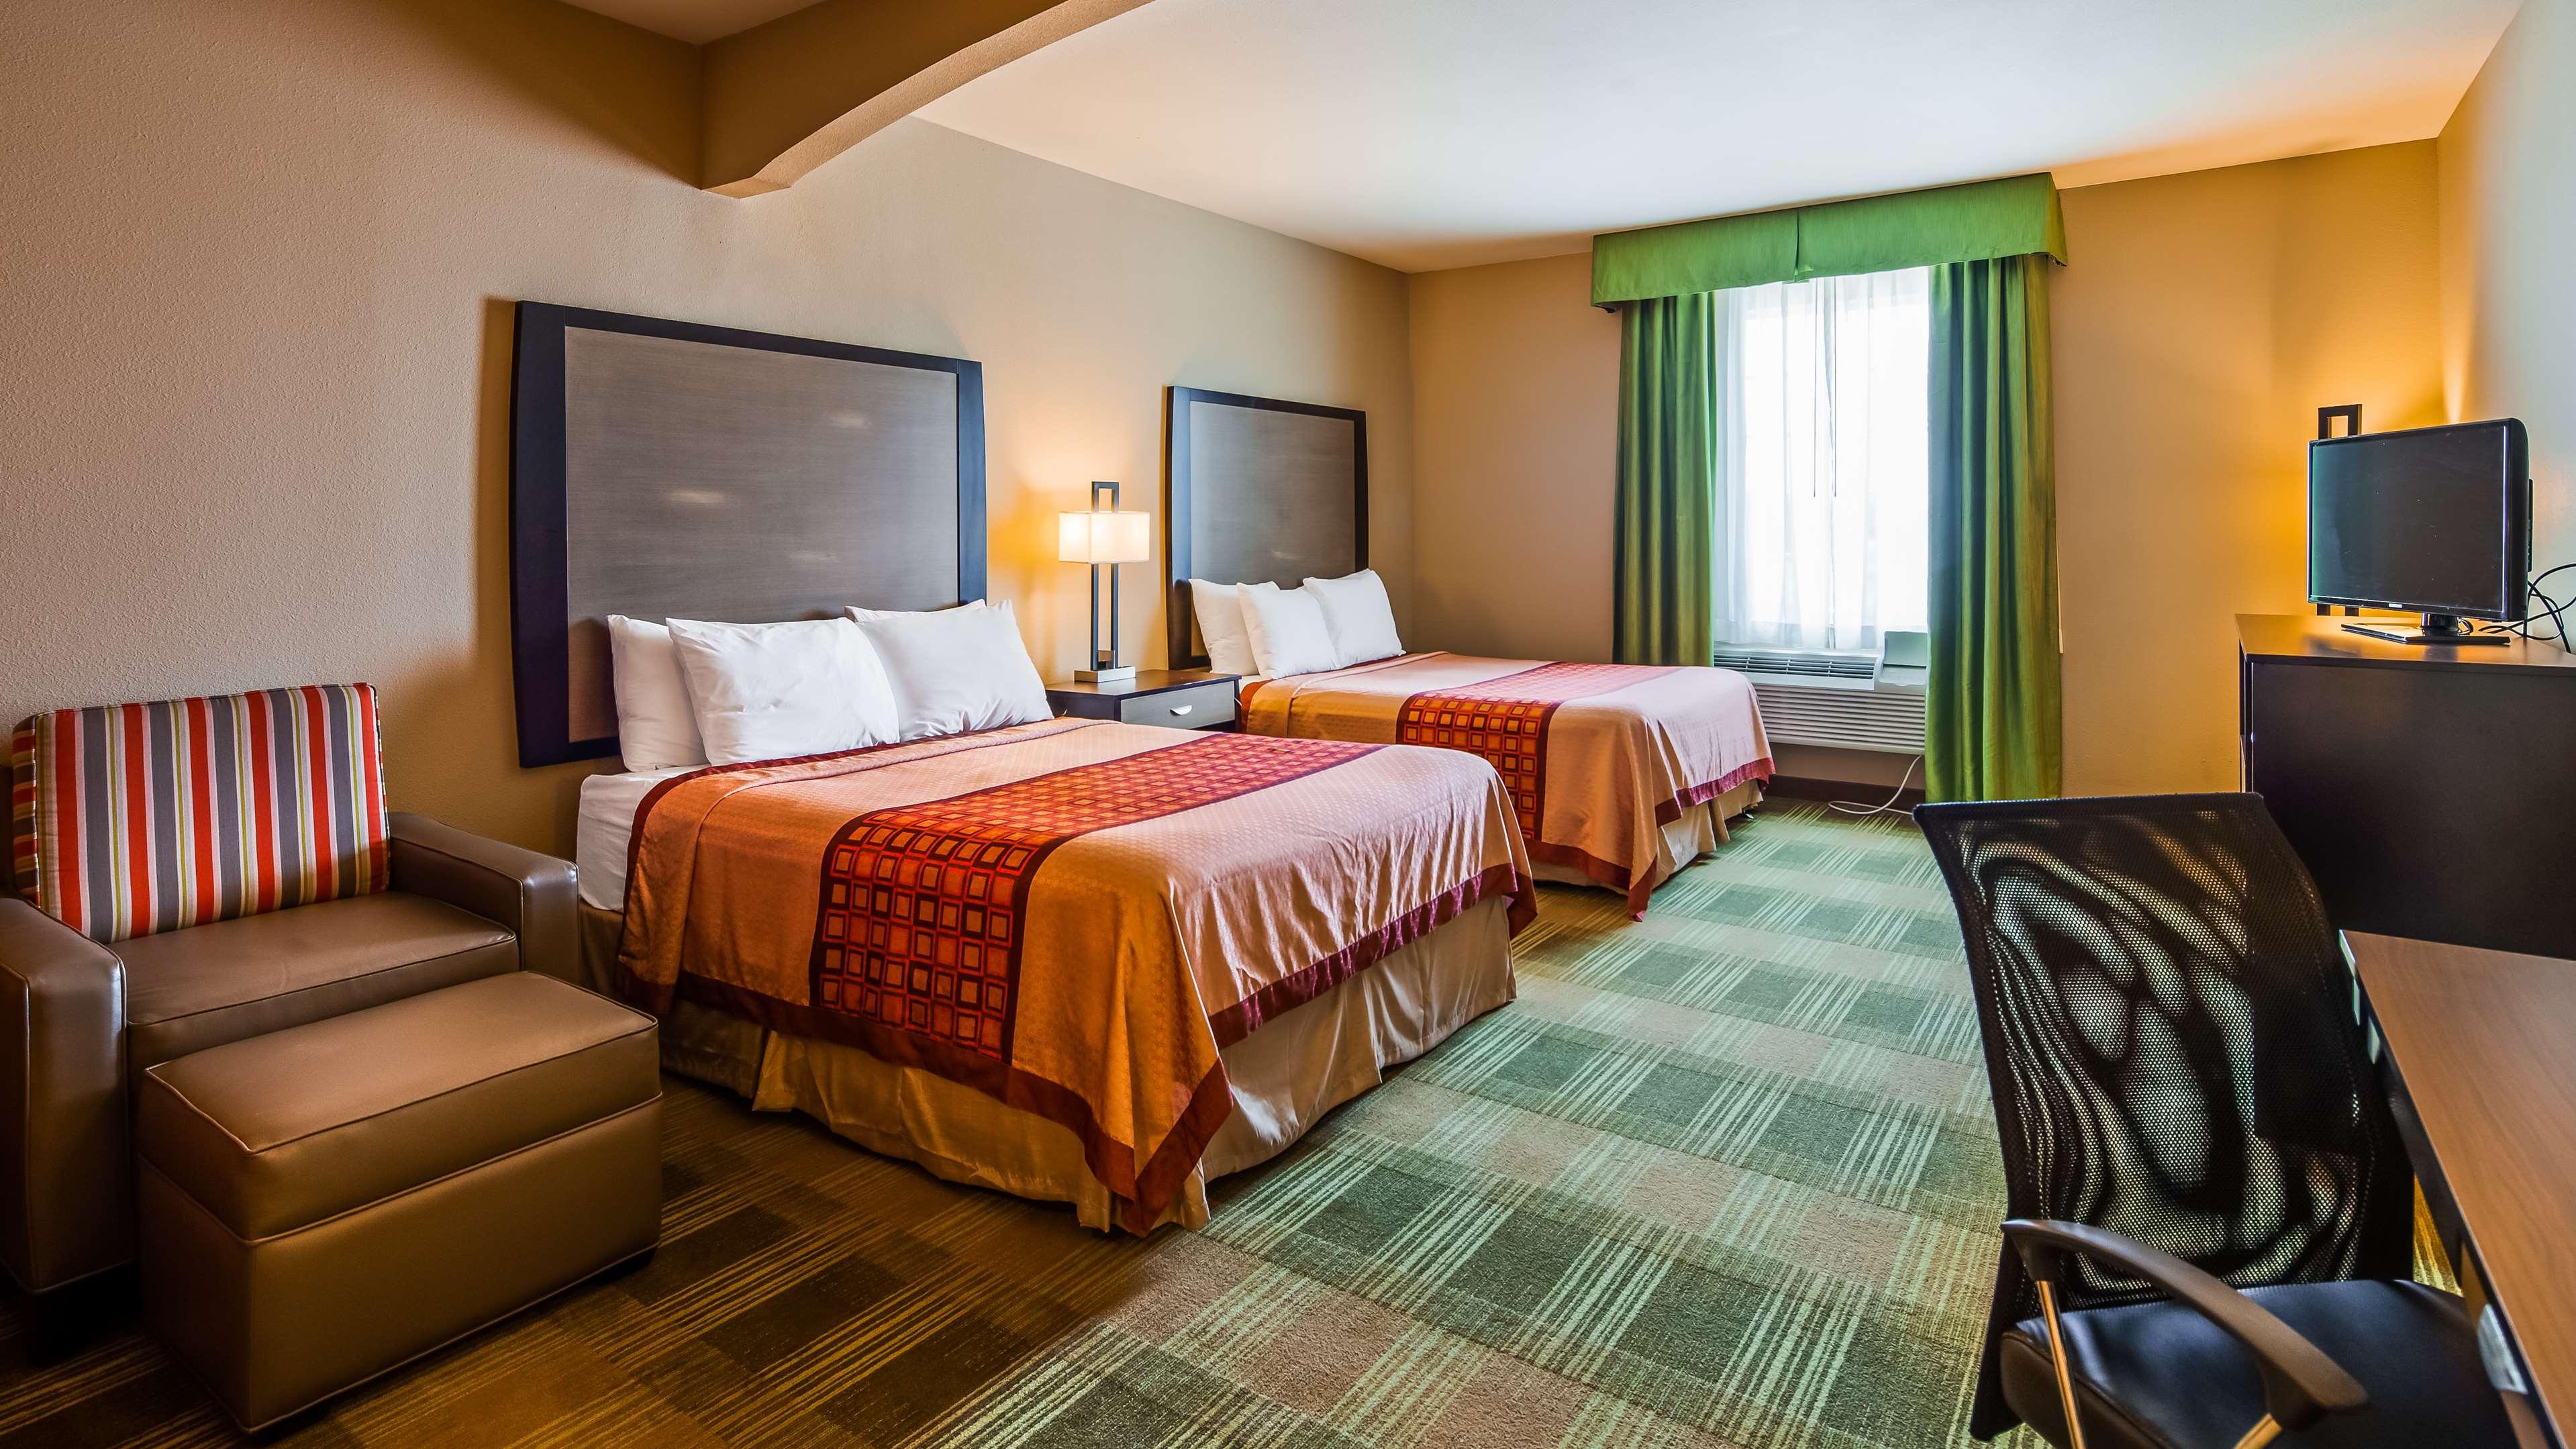 SureStay Hotel by Best Western Cotulla image 15